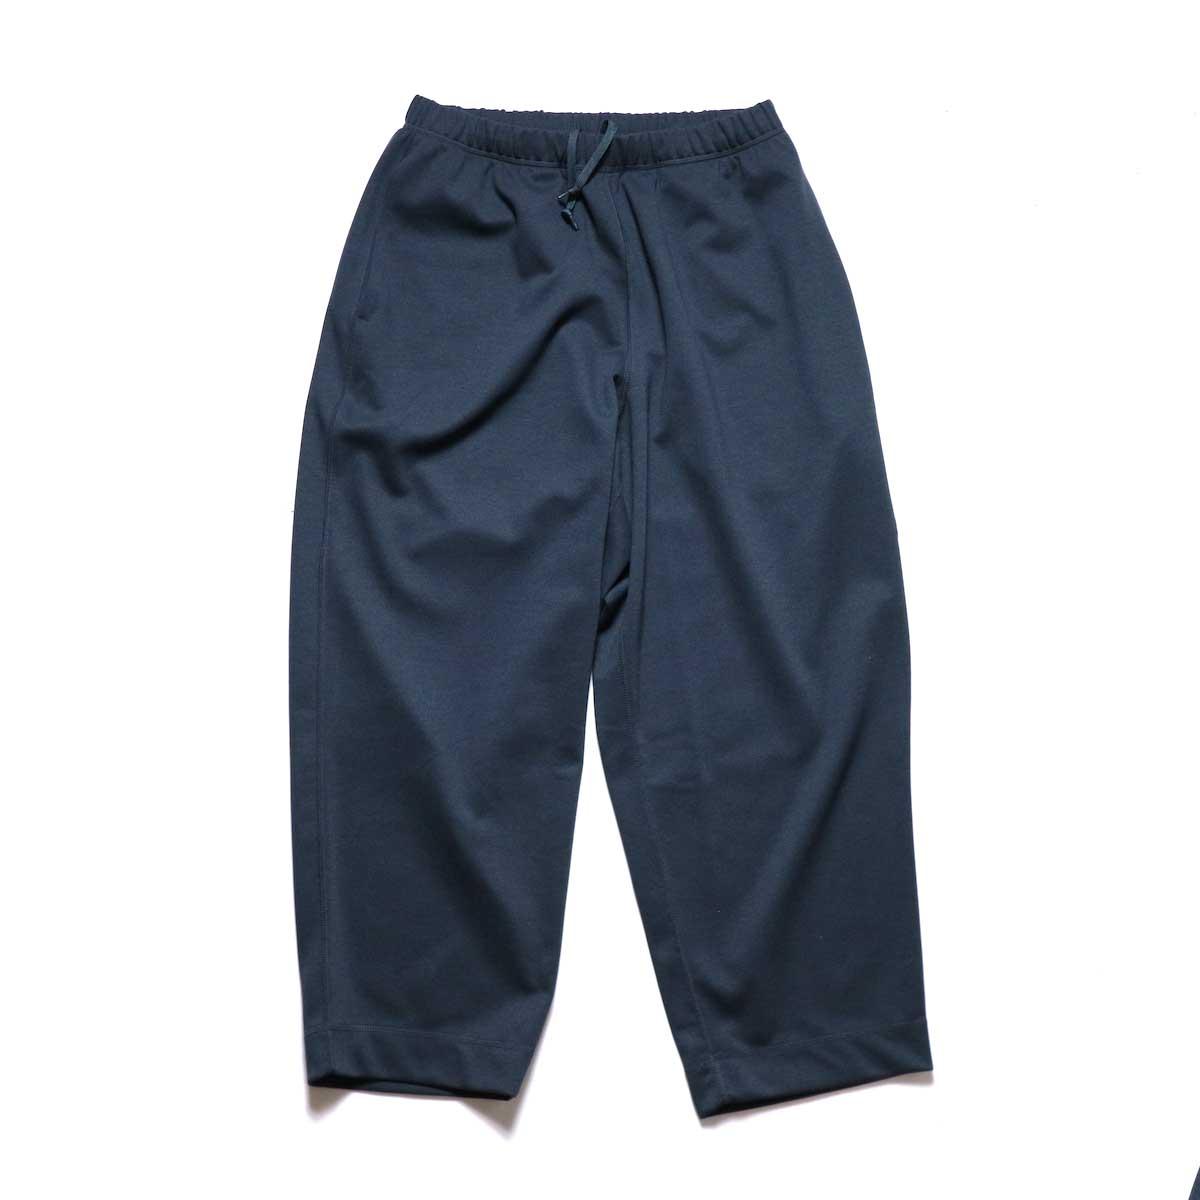 N.HOOLYWOOD / 24RCH-090 Easy Pants (Charcoal)